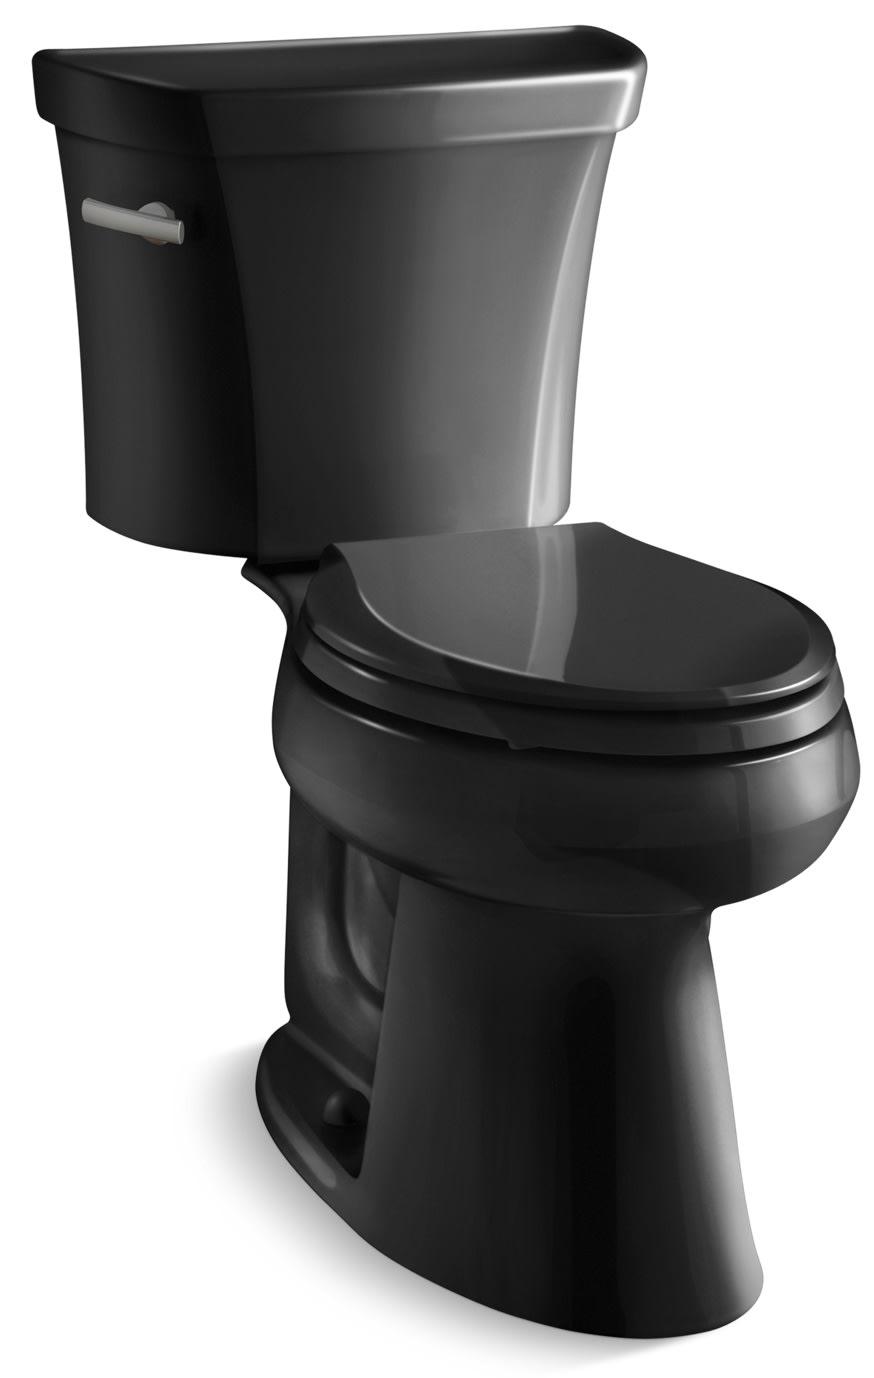 Strange Kohler K 3999 U 7 Black 1 28 Gpf Two Piece Comfort Height Machost Co Dining Chair Design Ideas Machostcouk